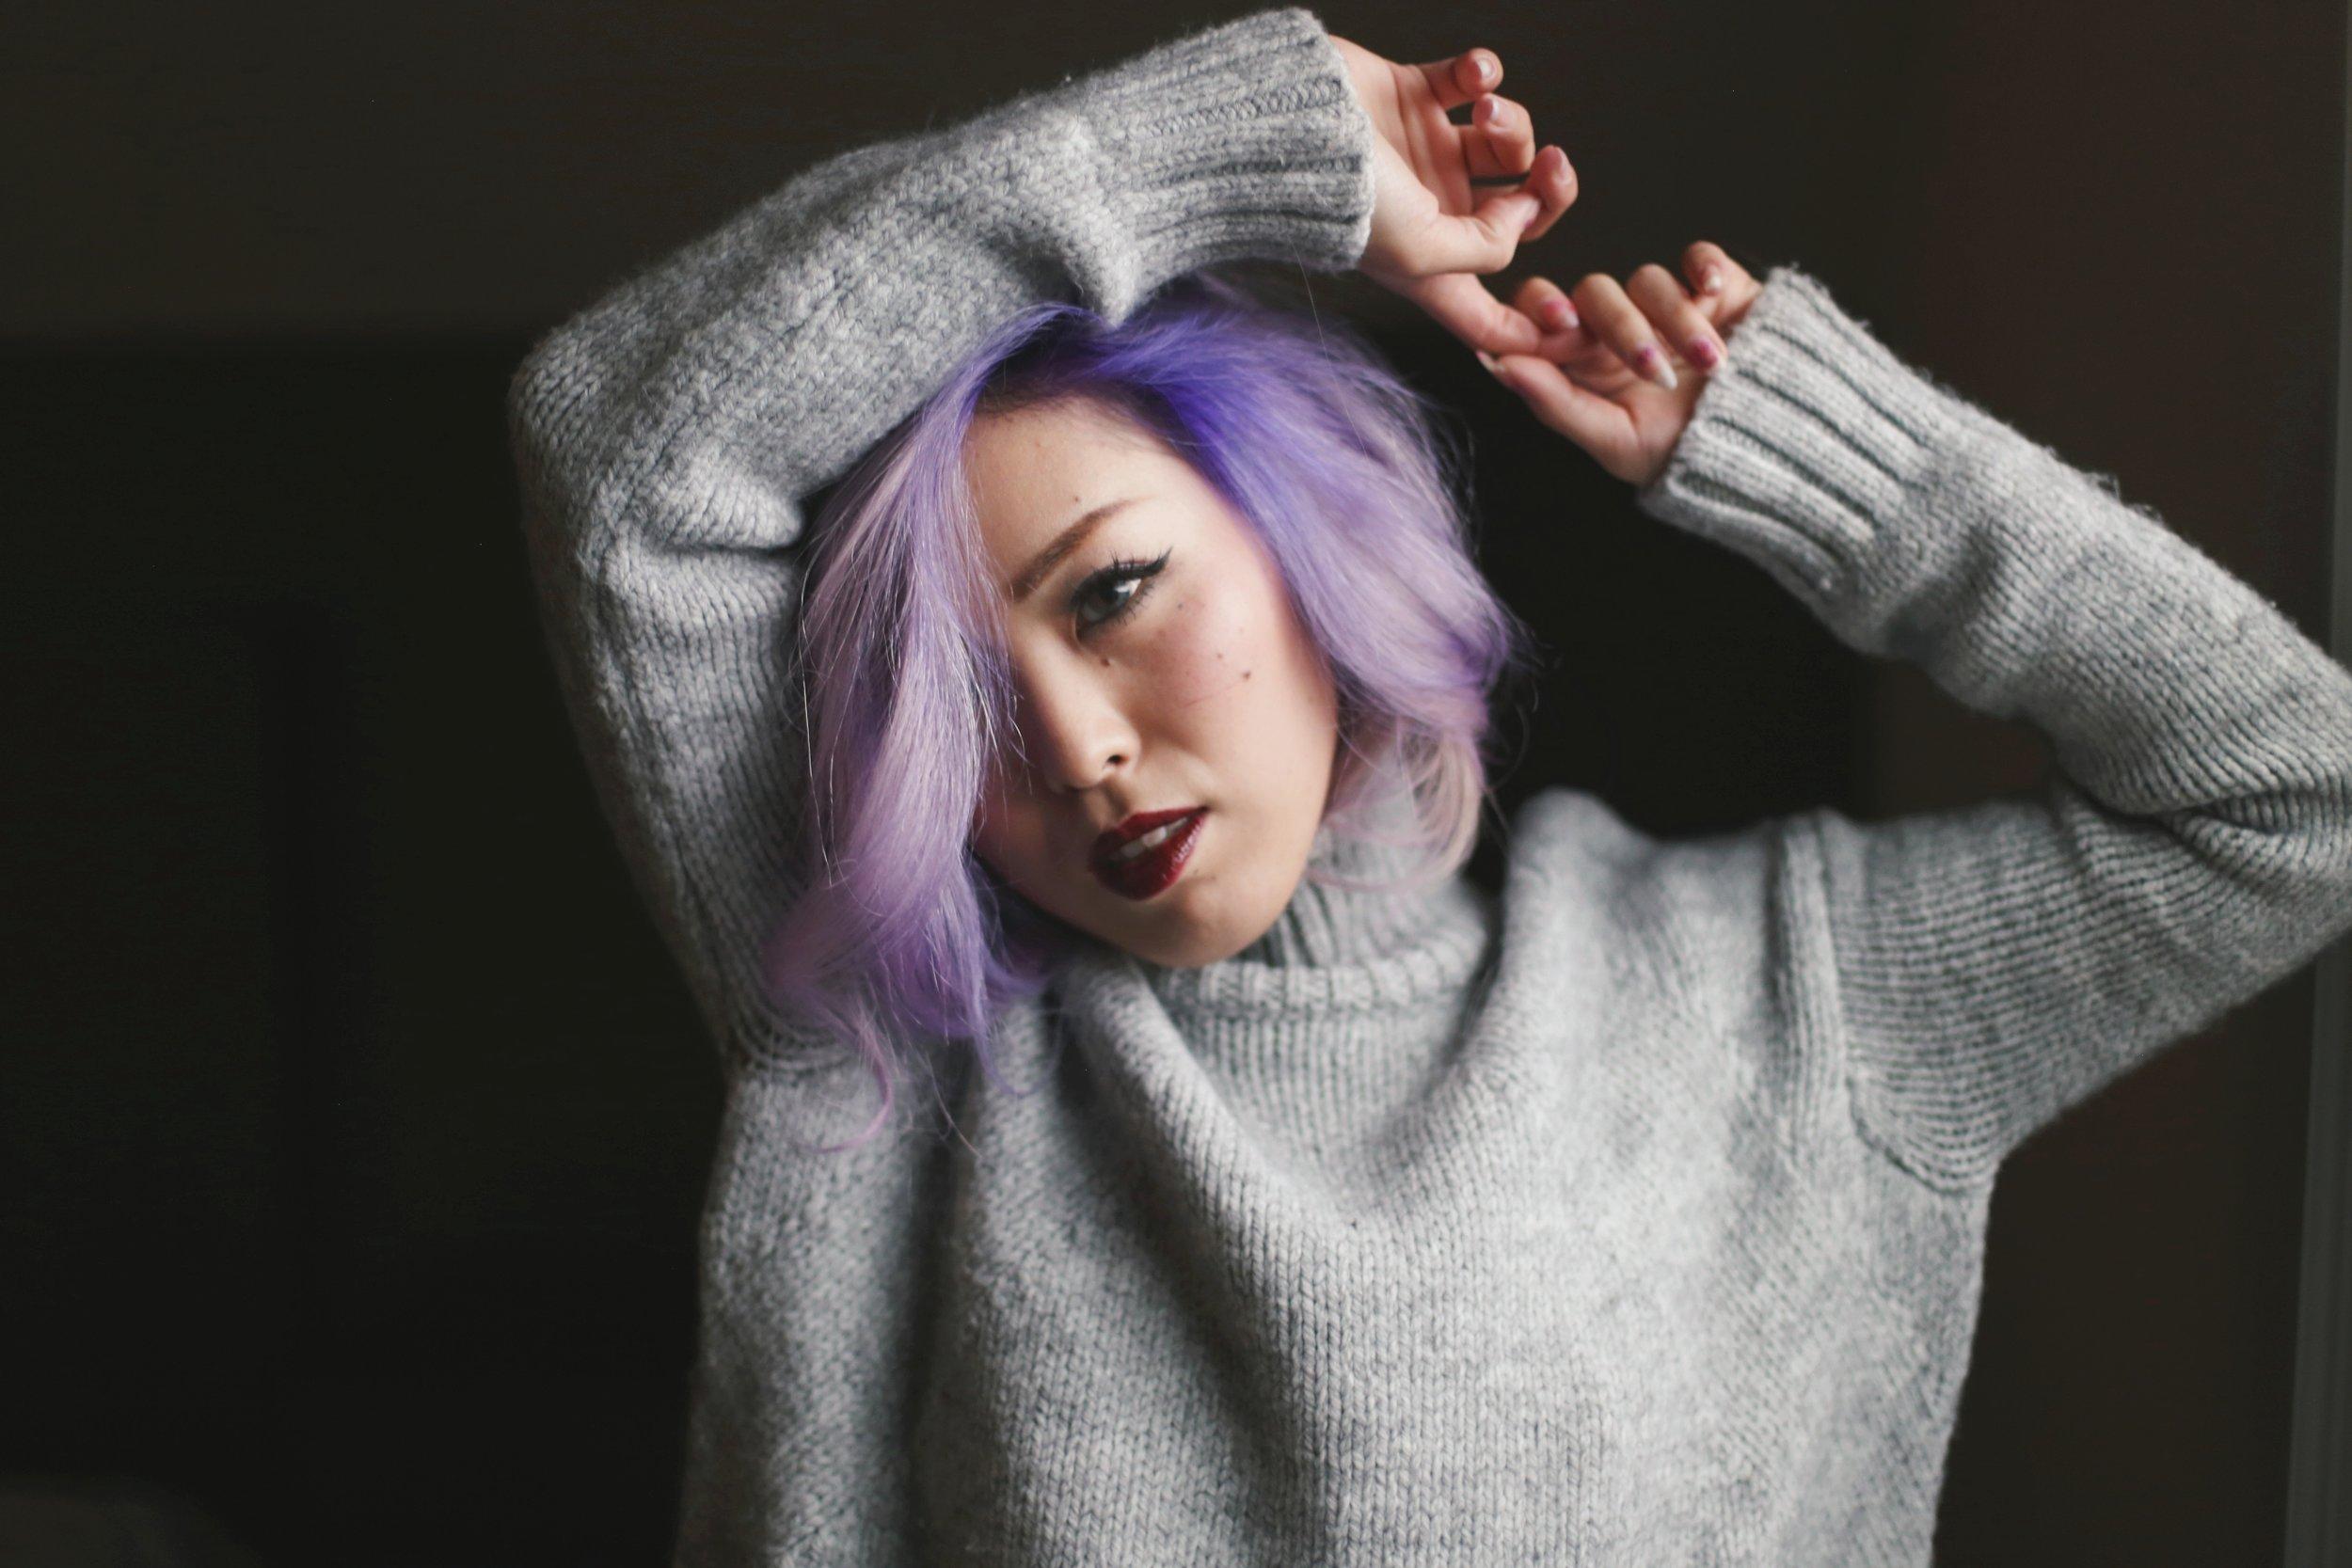 Boudoir Photo-black and white photography-sweater weather-turtle neck sweater-black lingerie-dark lipstick-japanese-Aika's Love Closet-Seattle model-Seattle Style blogger-Lavender Hair-colored Hair-Mermaid Hair-zara Sweater 2